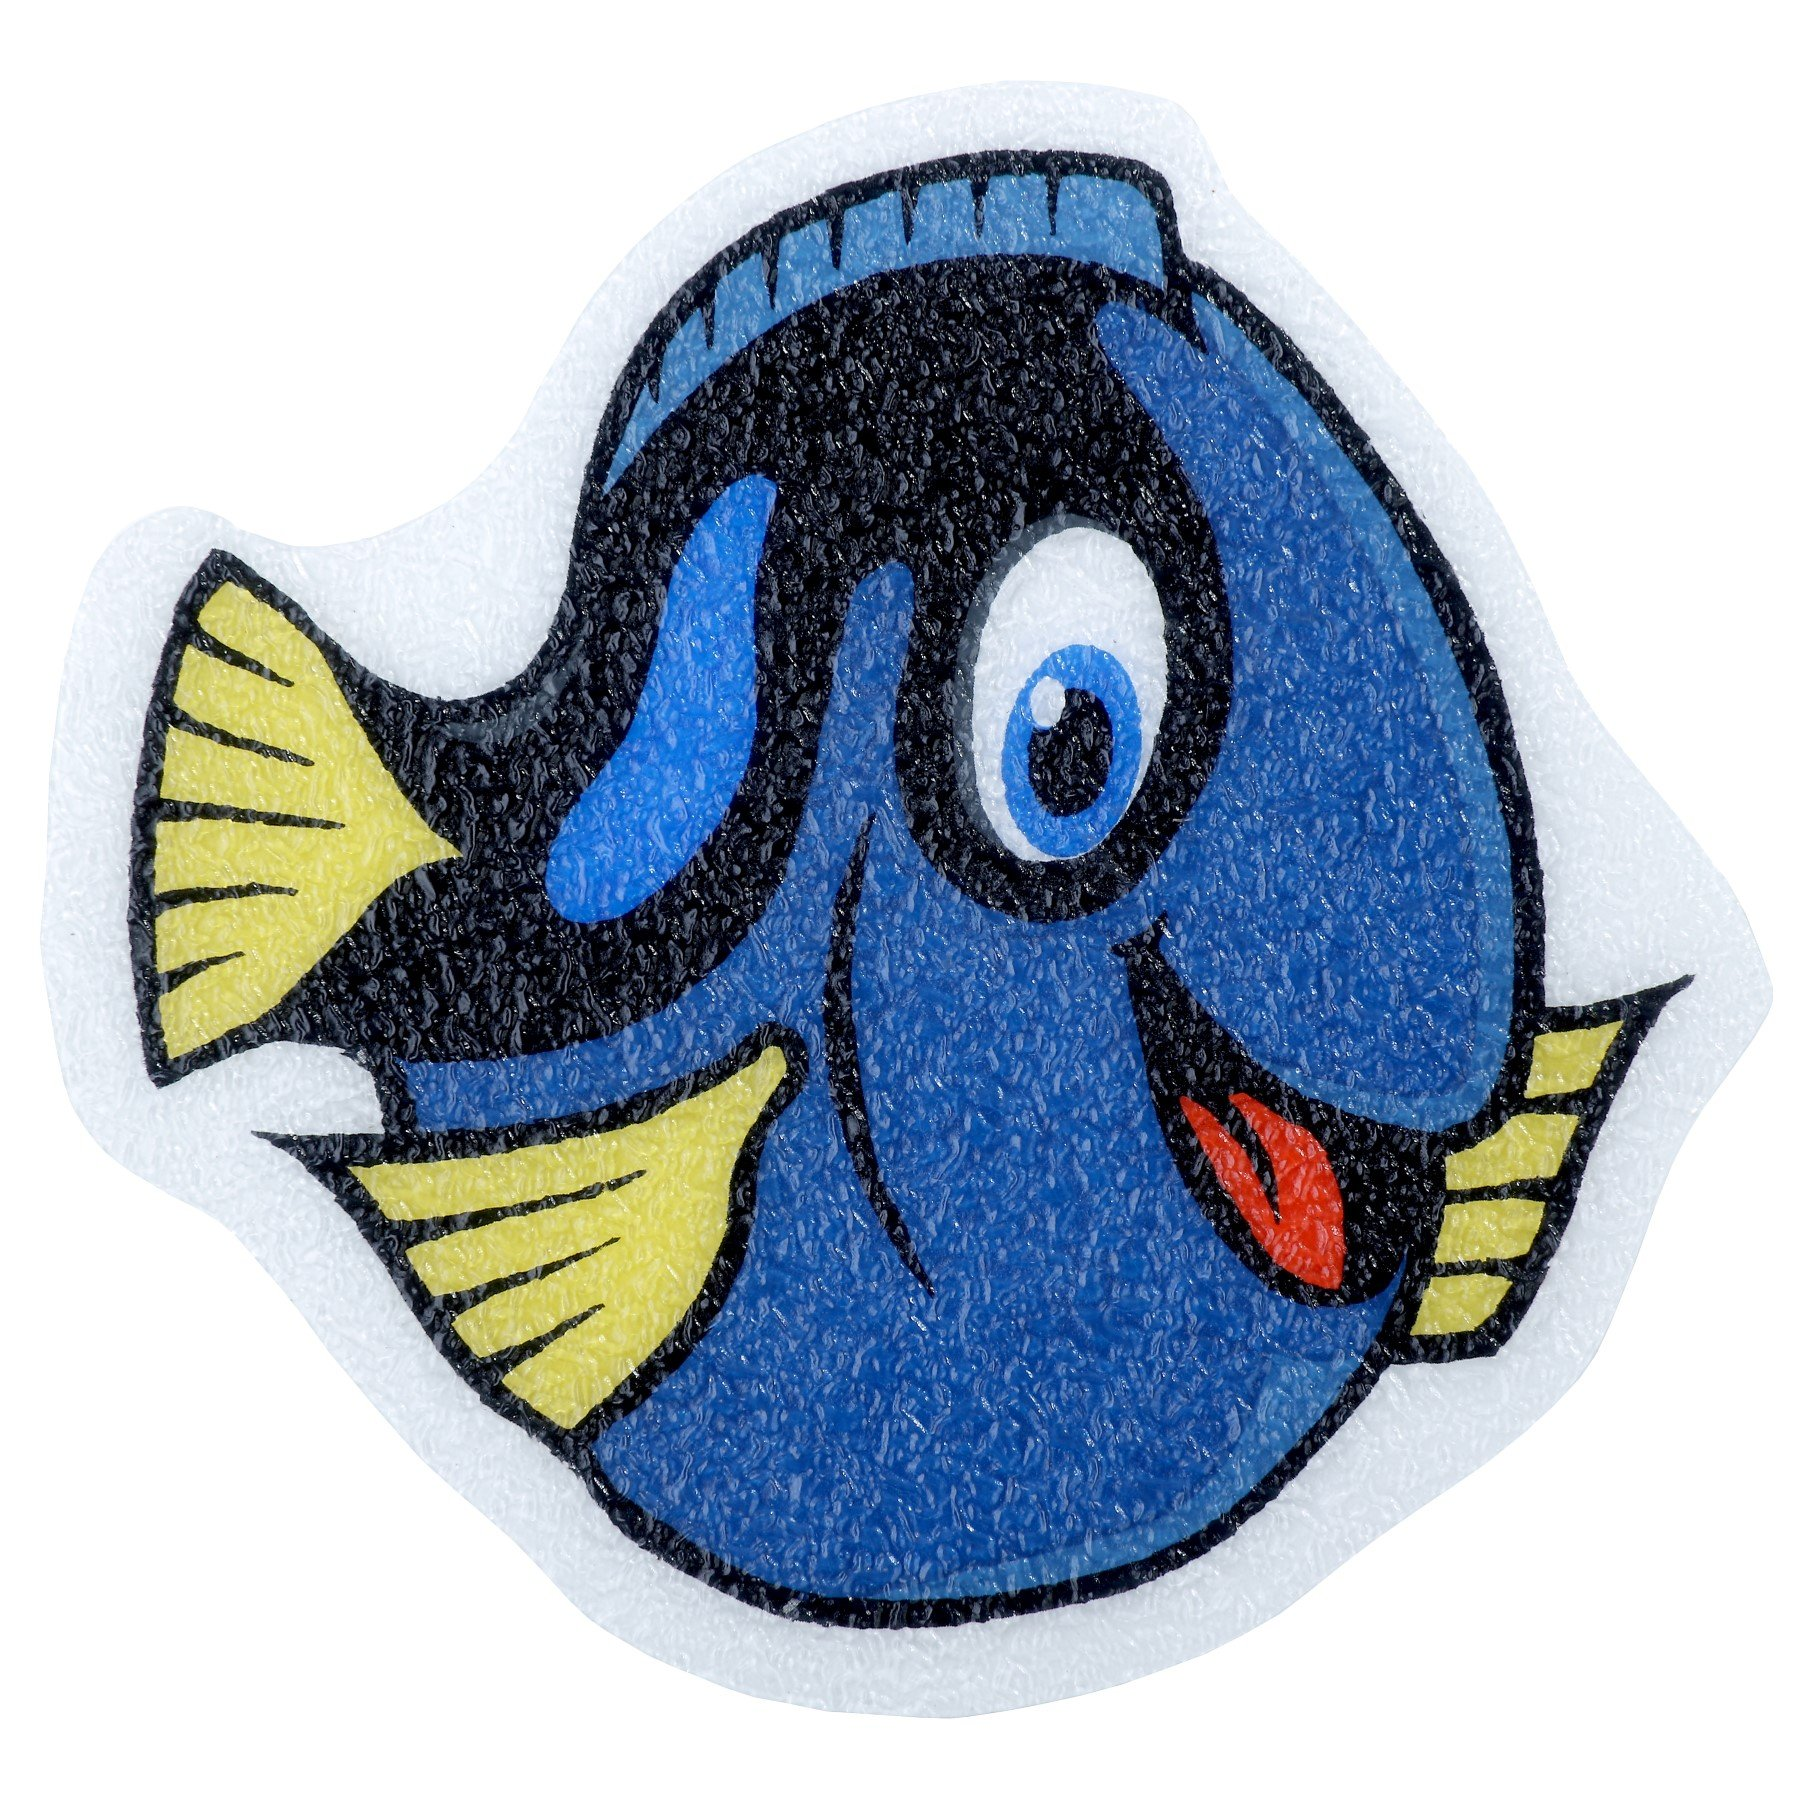 Amazon.com: SlipX Solutions Adhesive Bath Treads: Clownfish Tub ...